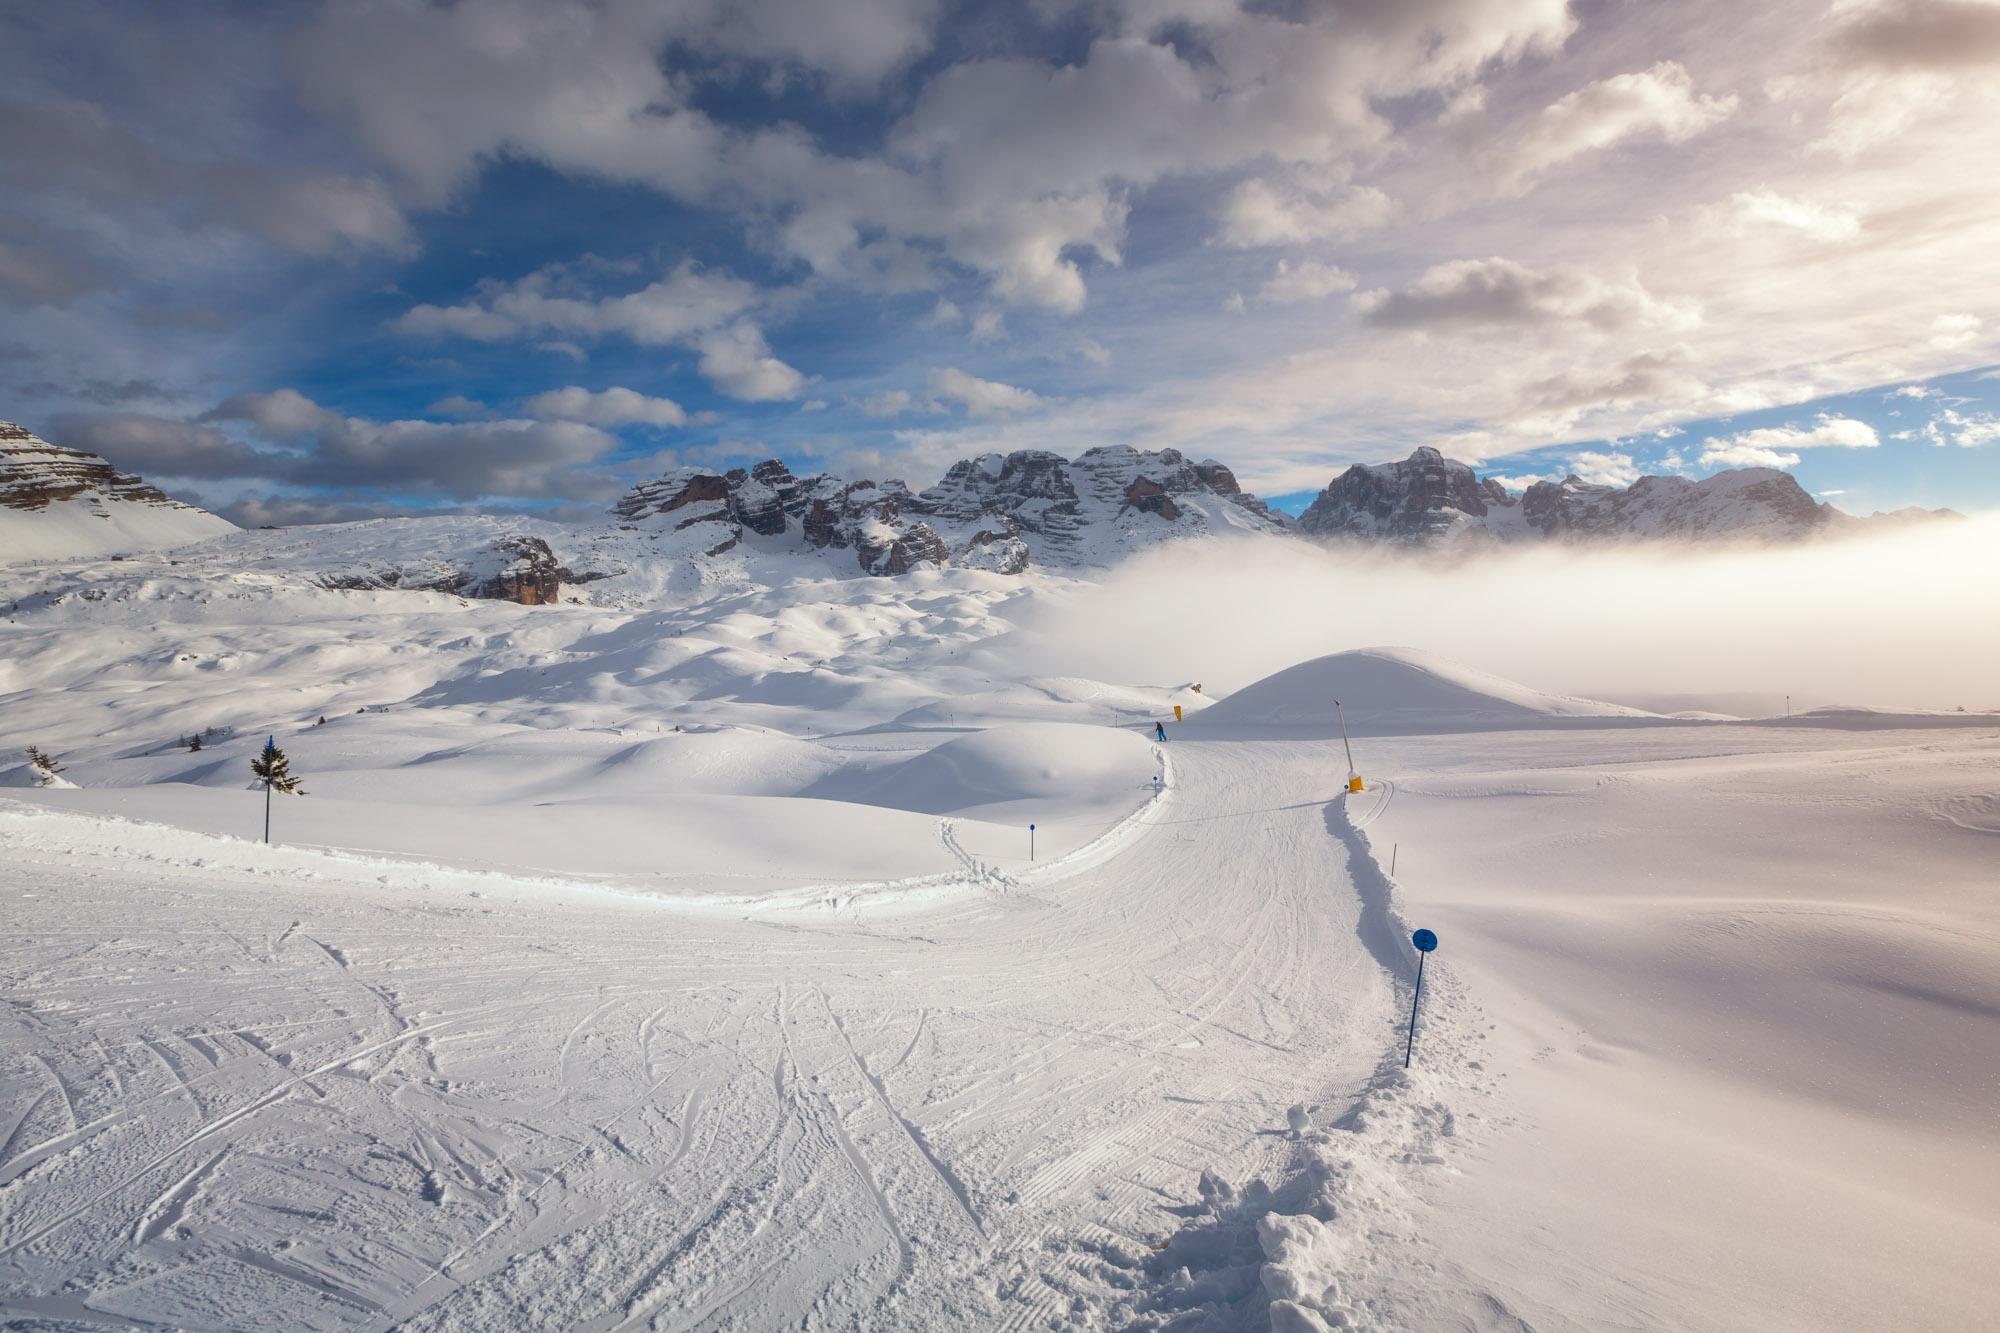 Ski Slope, Madonna di Campiglio Ski Resort, Italy